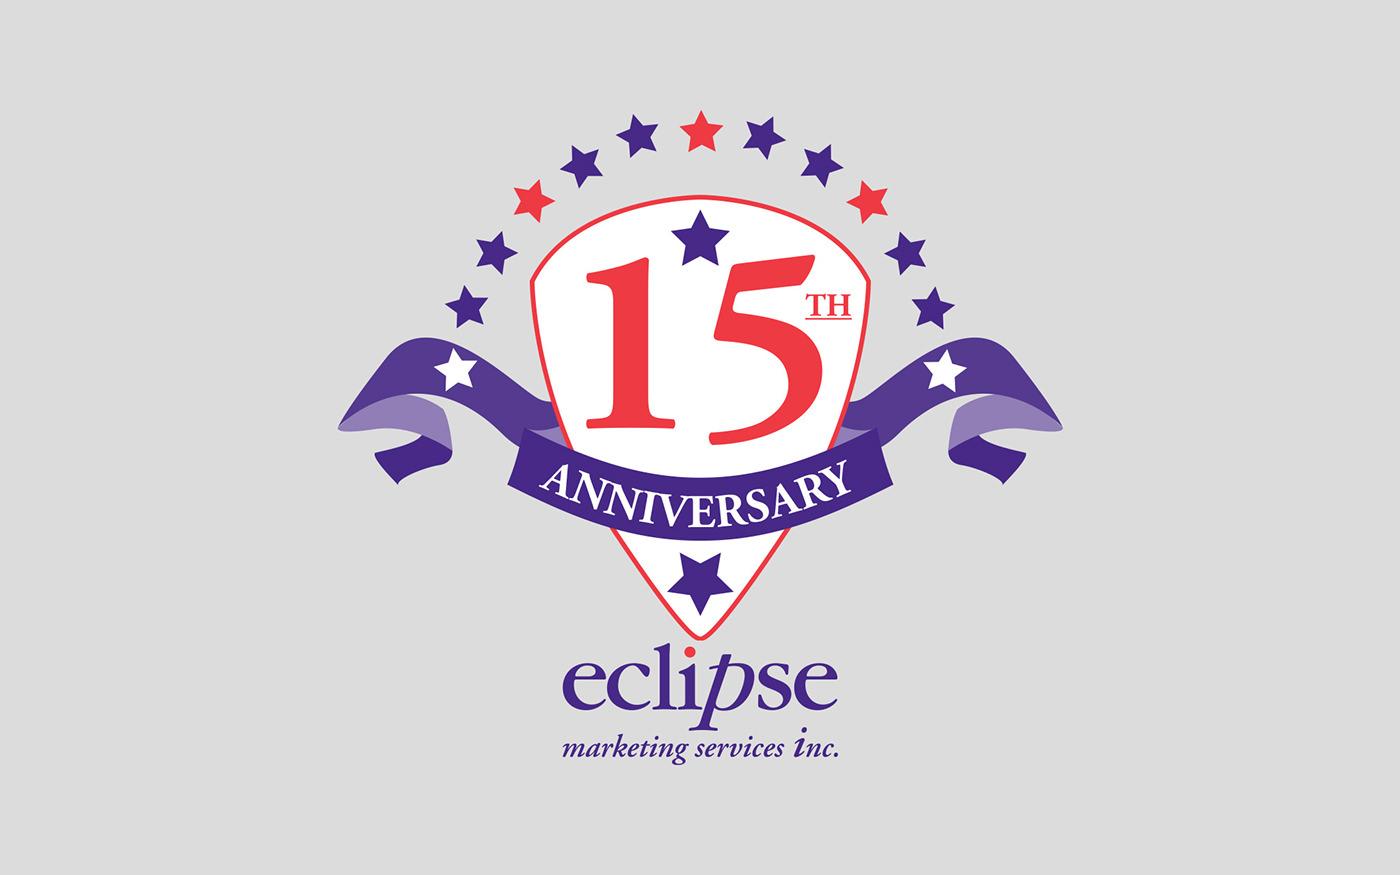 eclipse  15th  anniversary artwork poster  logo